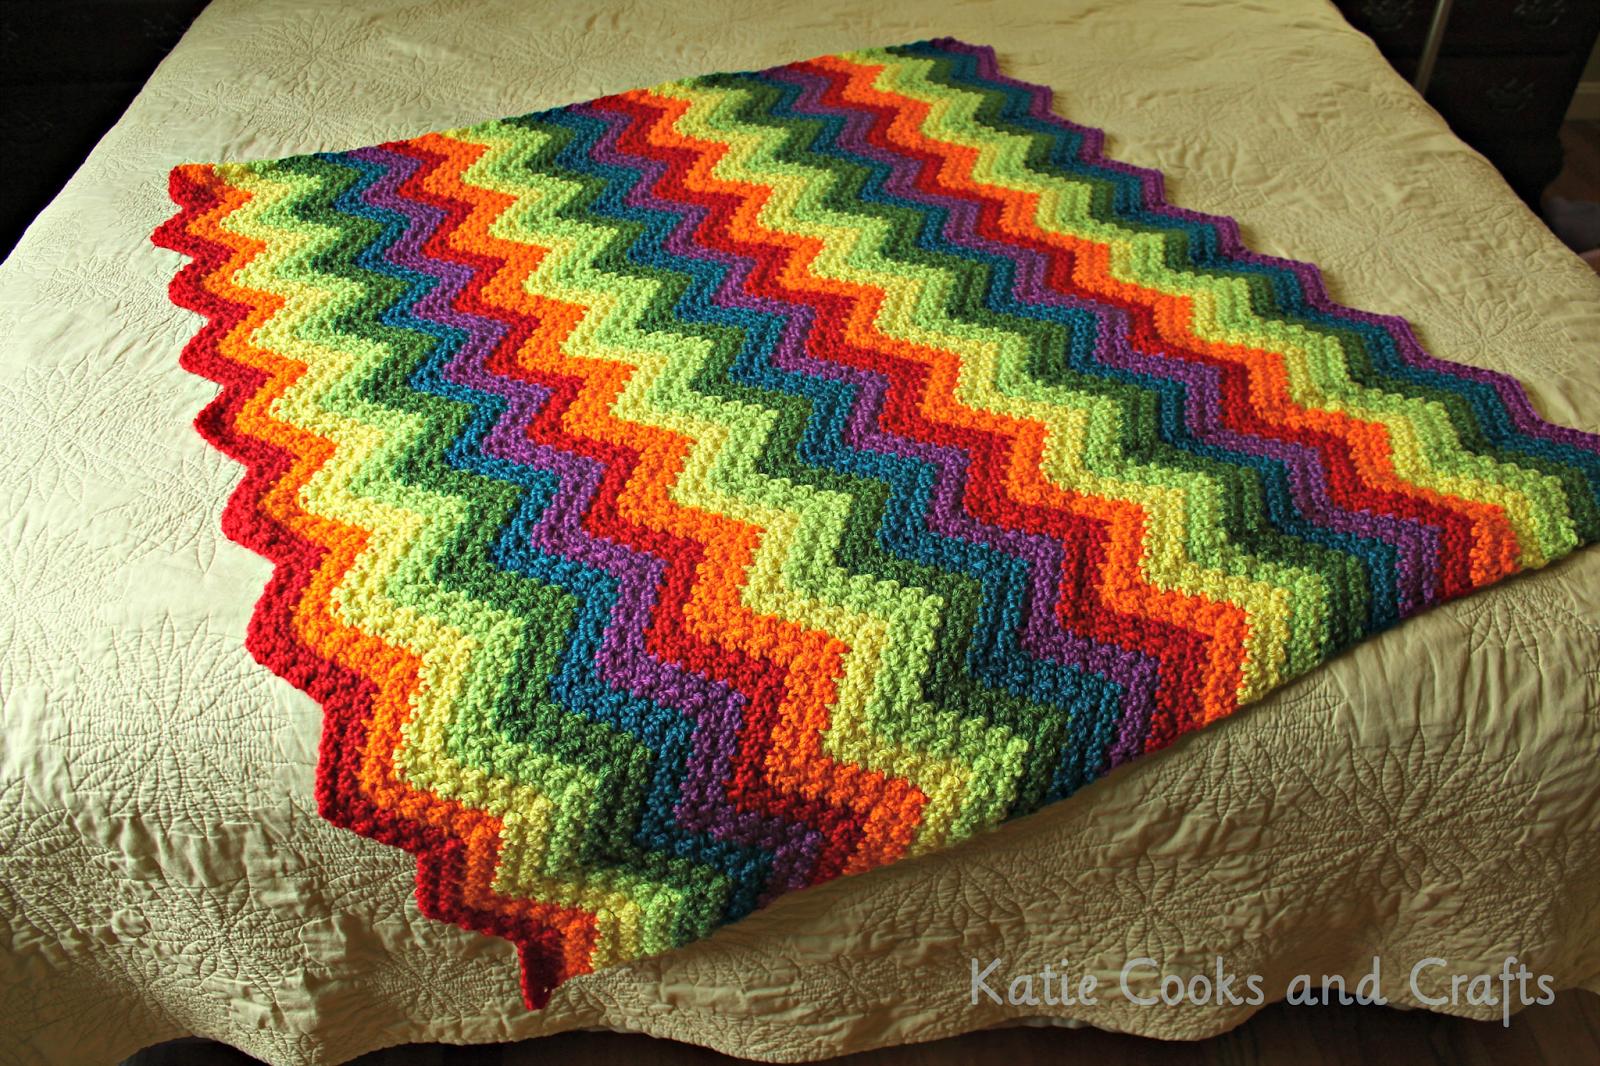 Katie Cooks and Crafts: Rumpled Ripple Rainbow Crochet